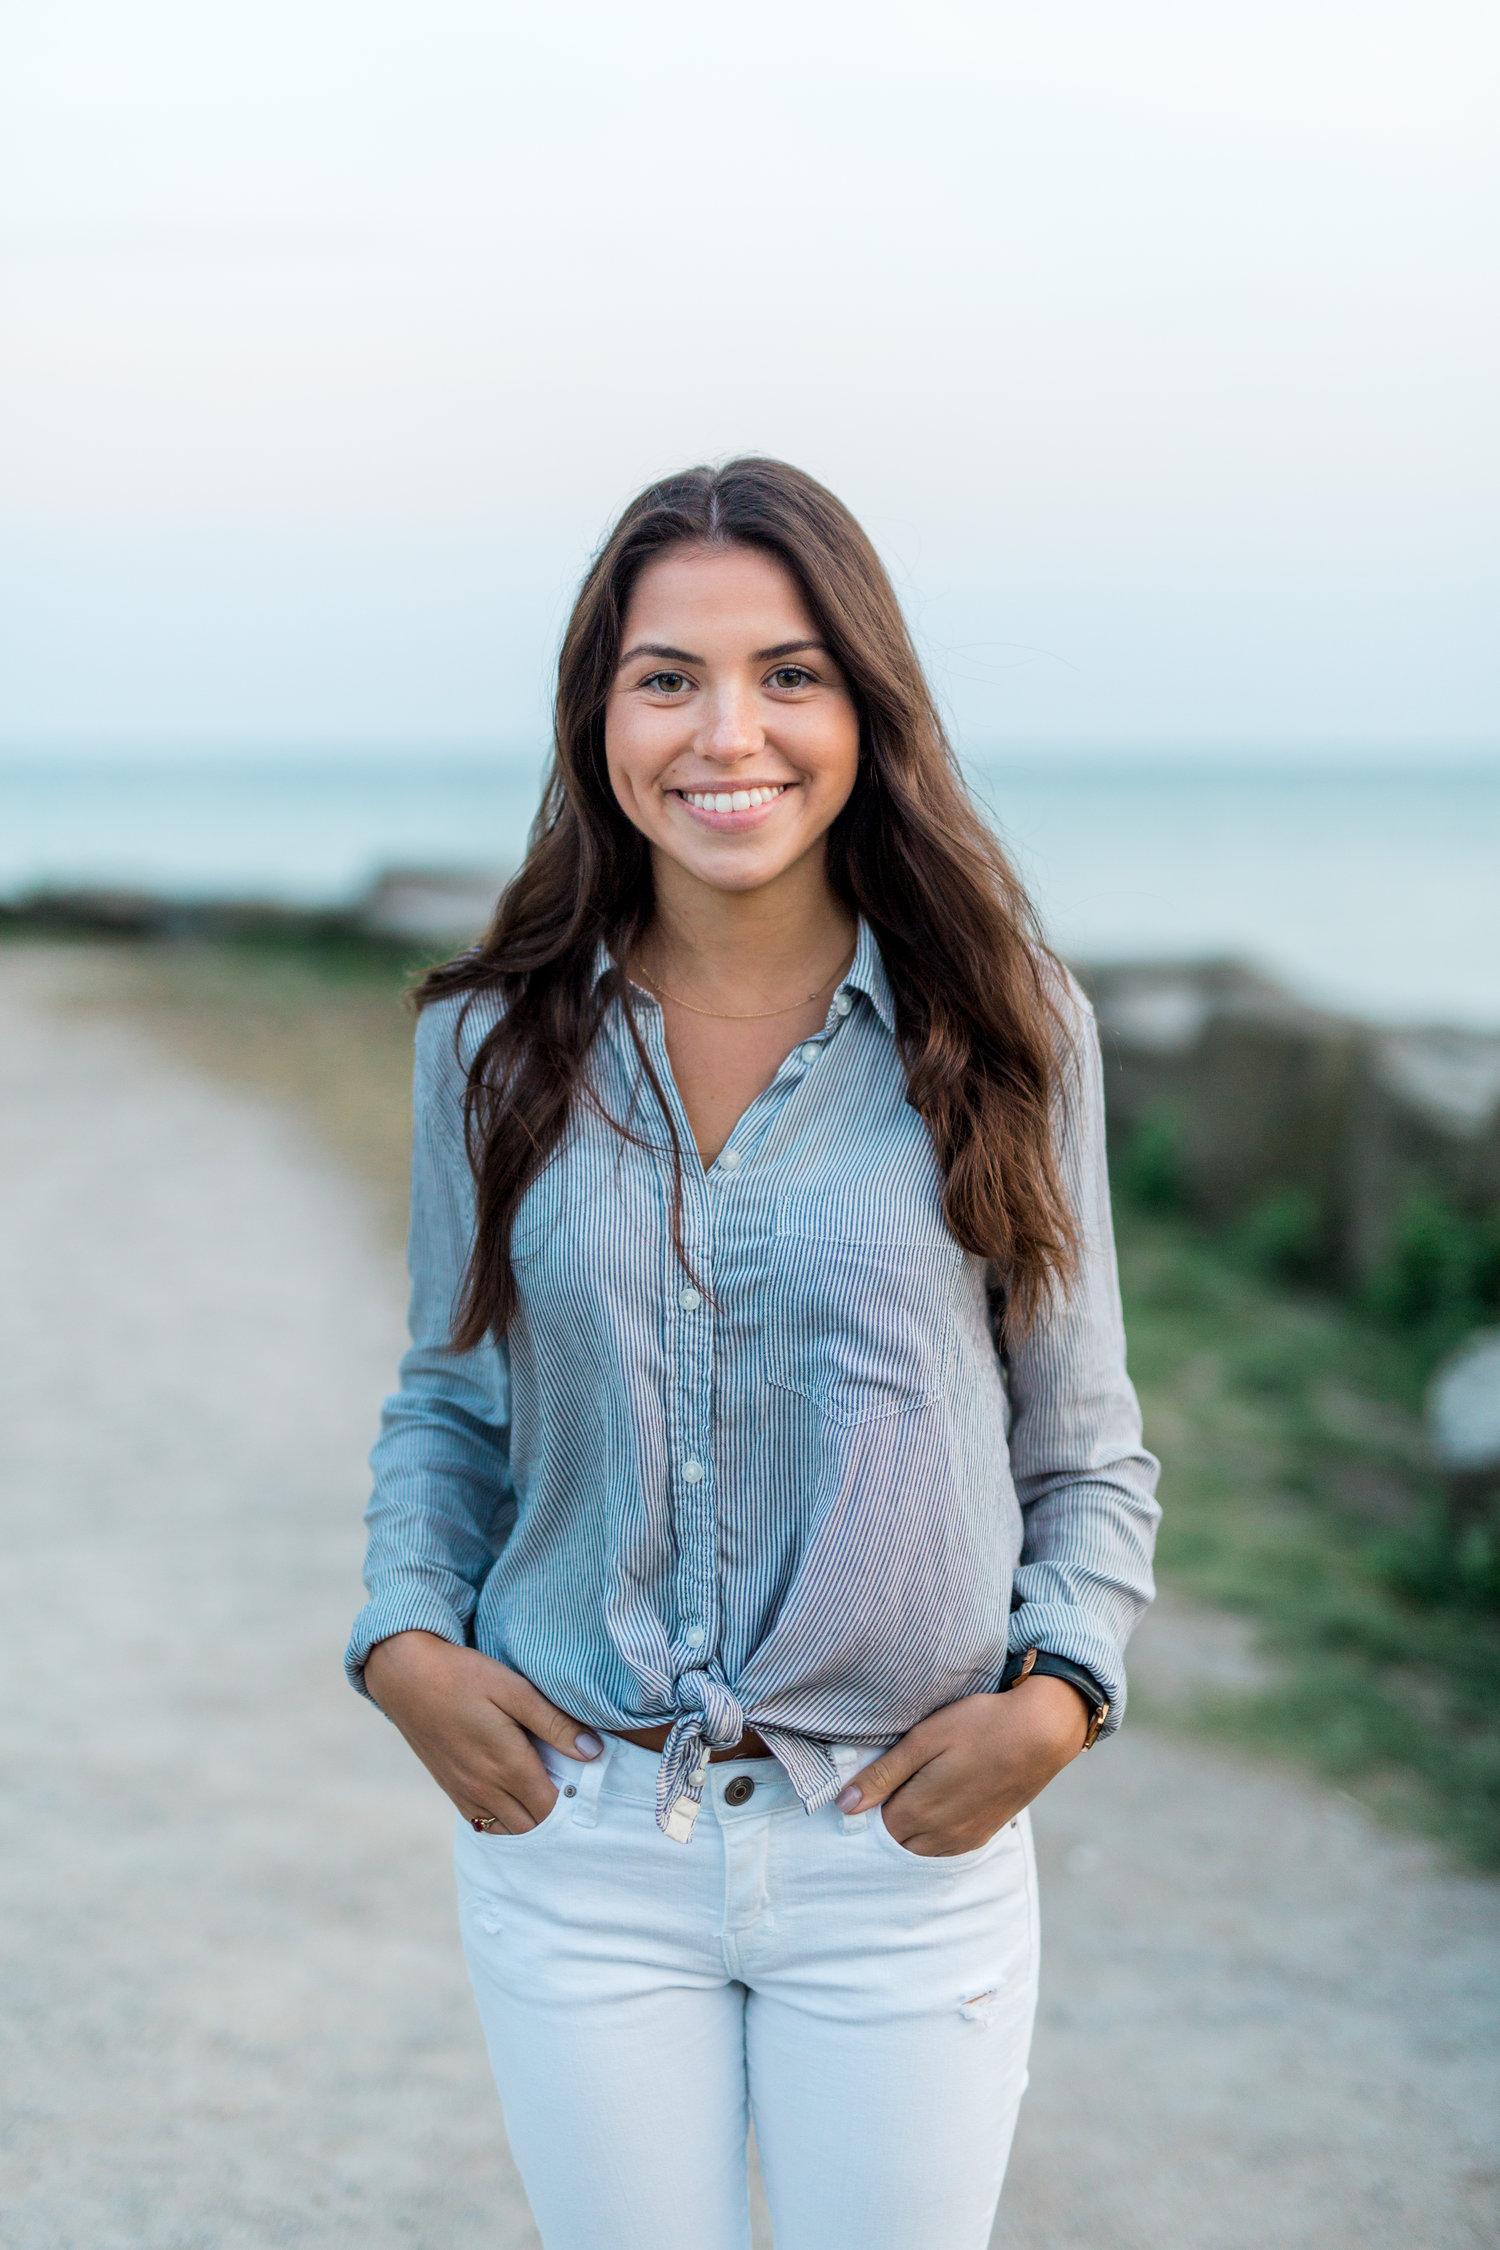 Danielle-Giroux-Amir-Golbazi-Genua-Family-Photography-Scarborough-Bluffs-9824.jpg